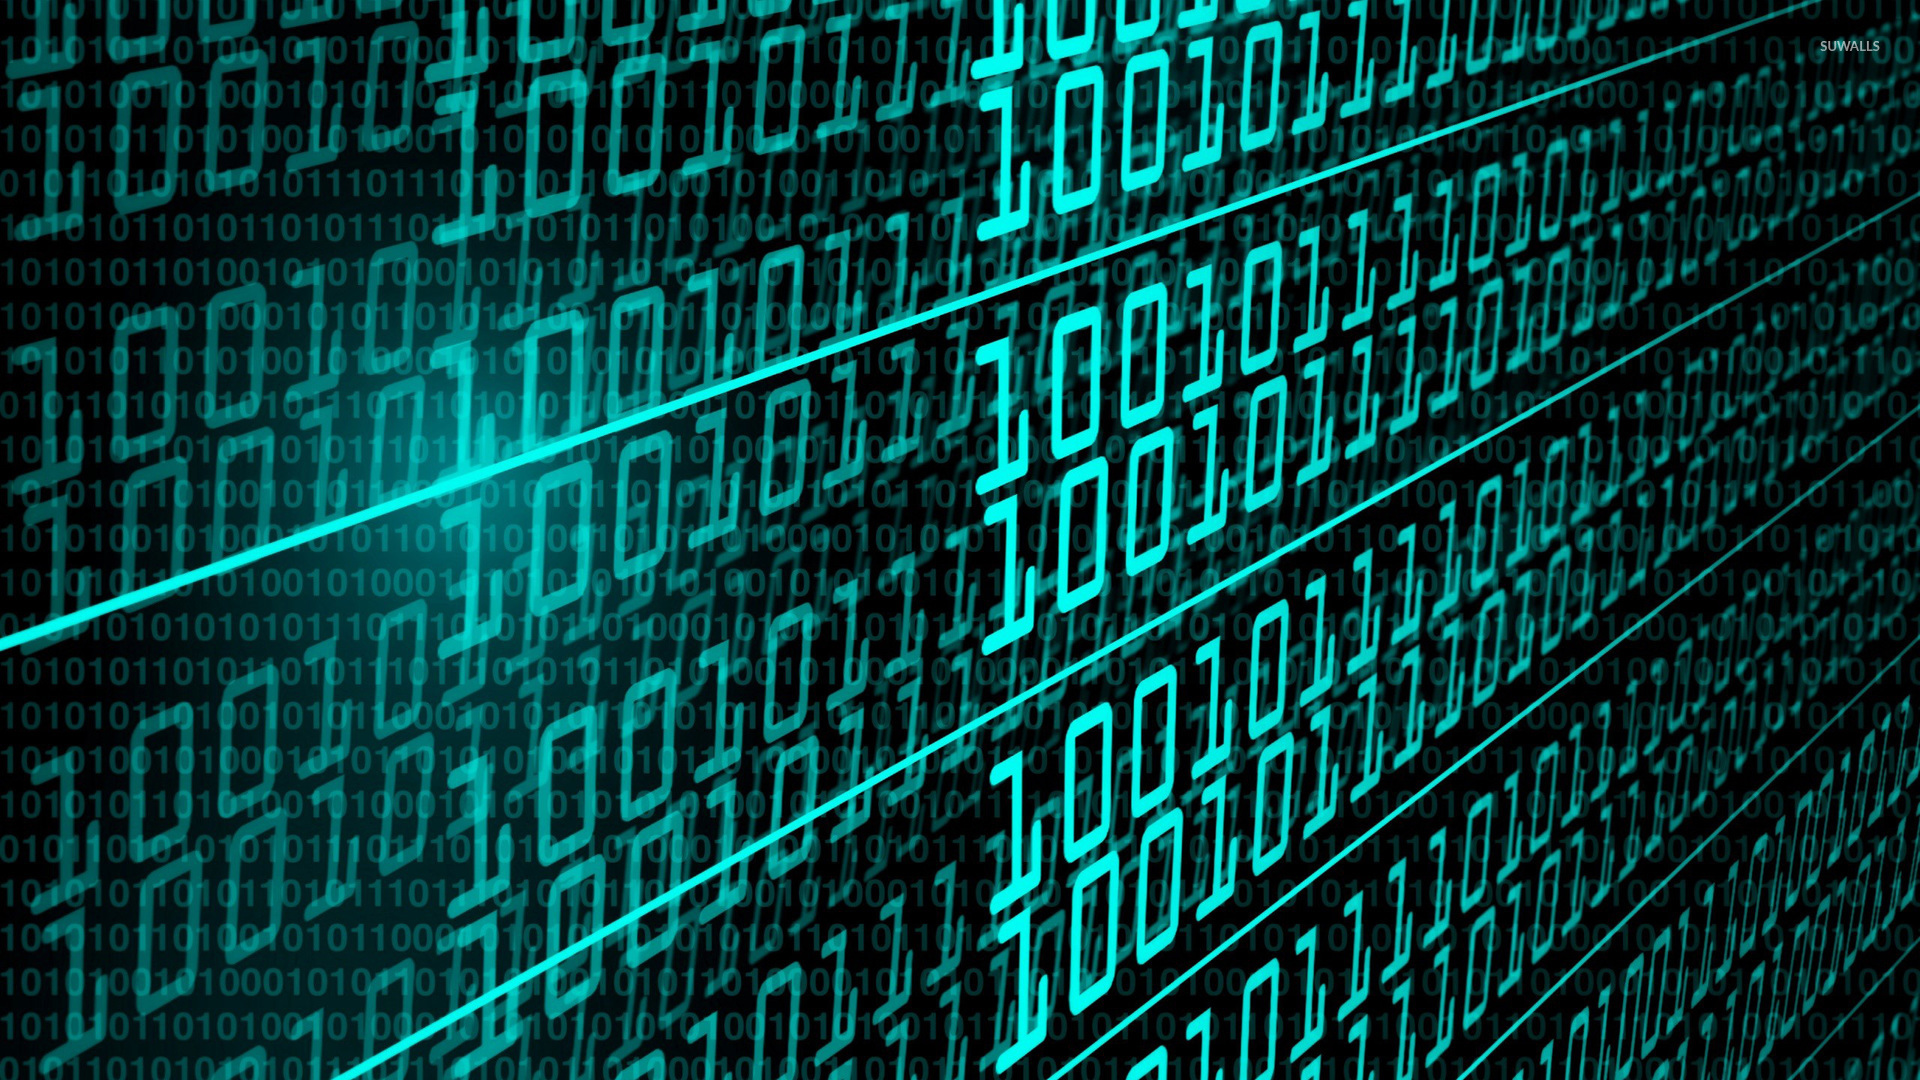 binary wallpaper wallpapersafari - photo #5